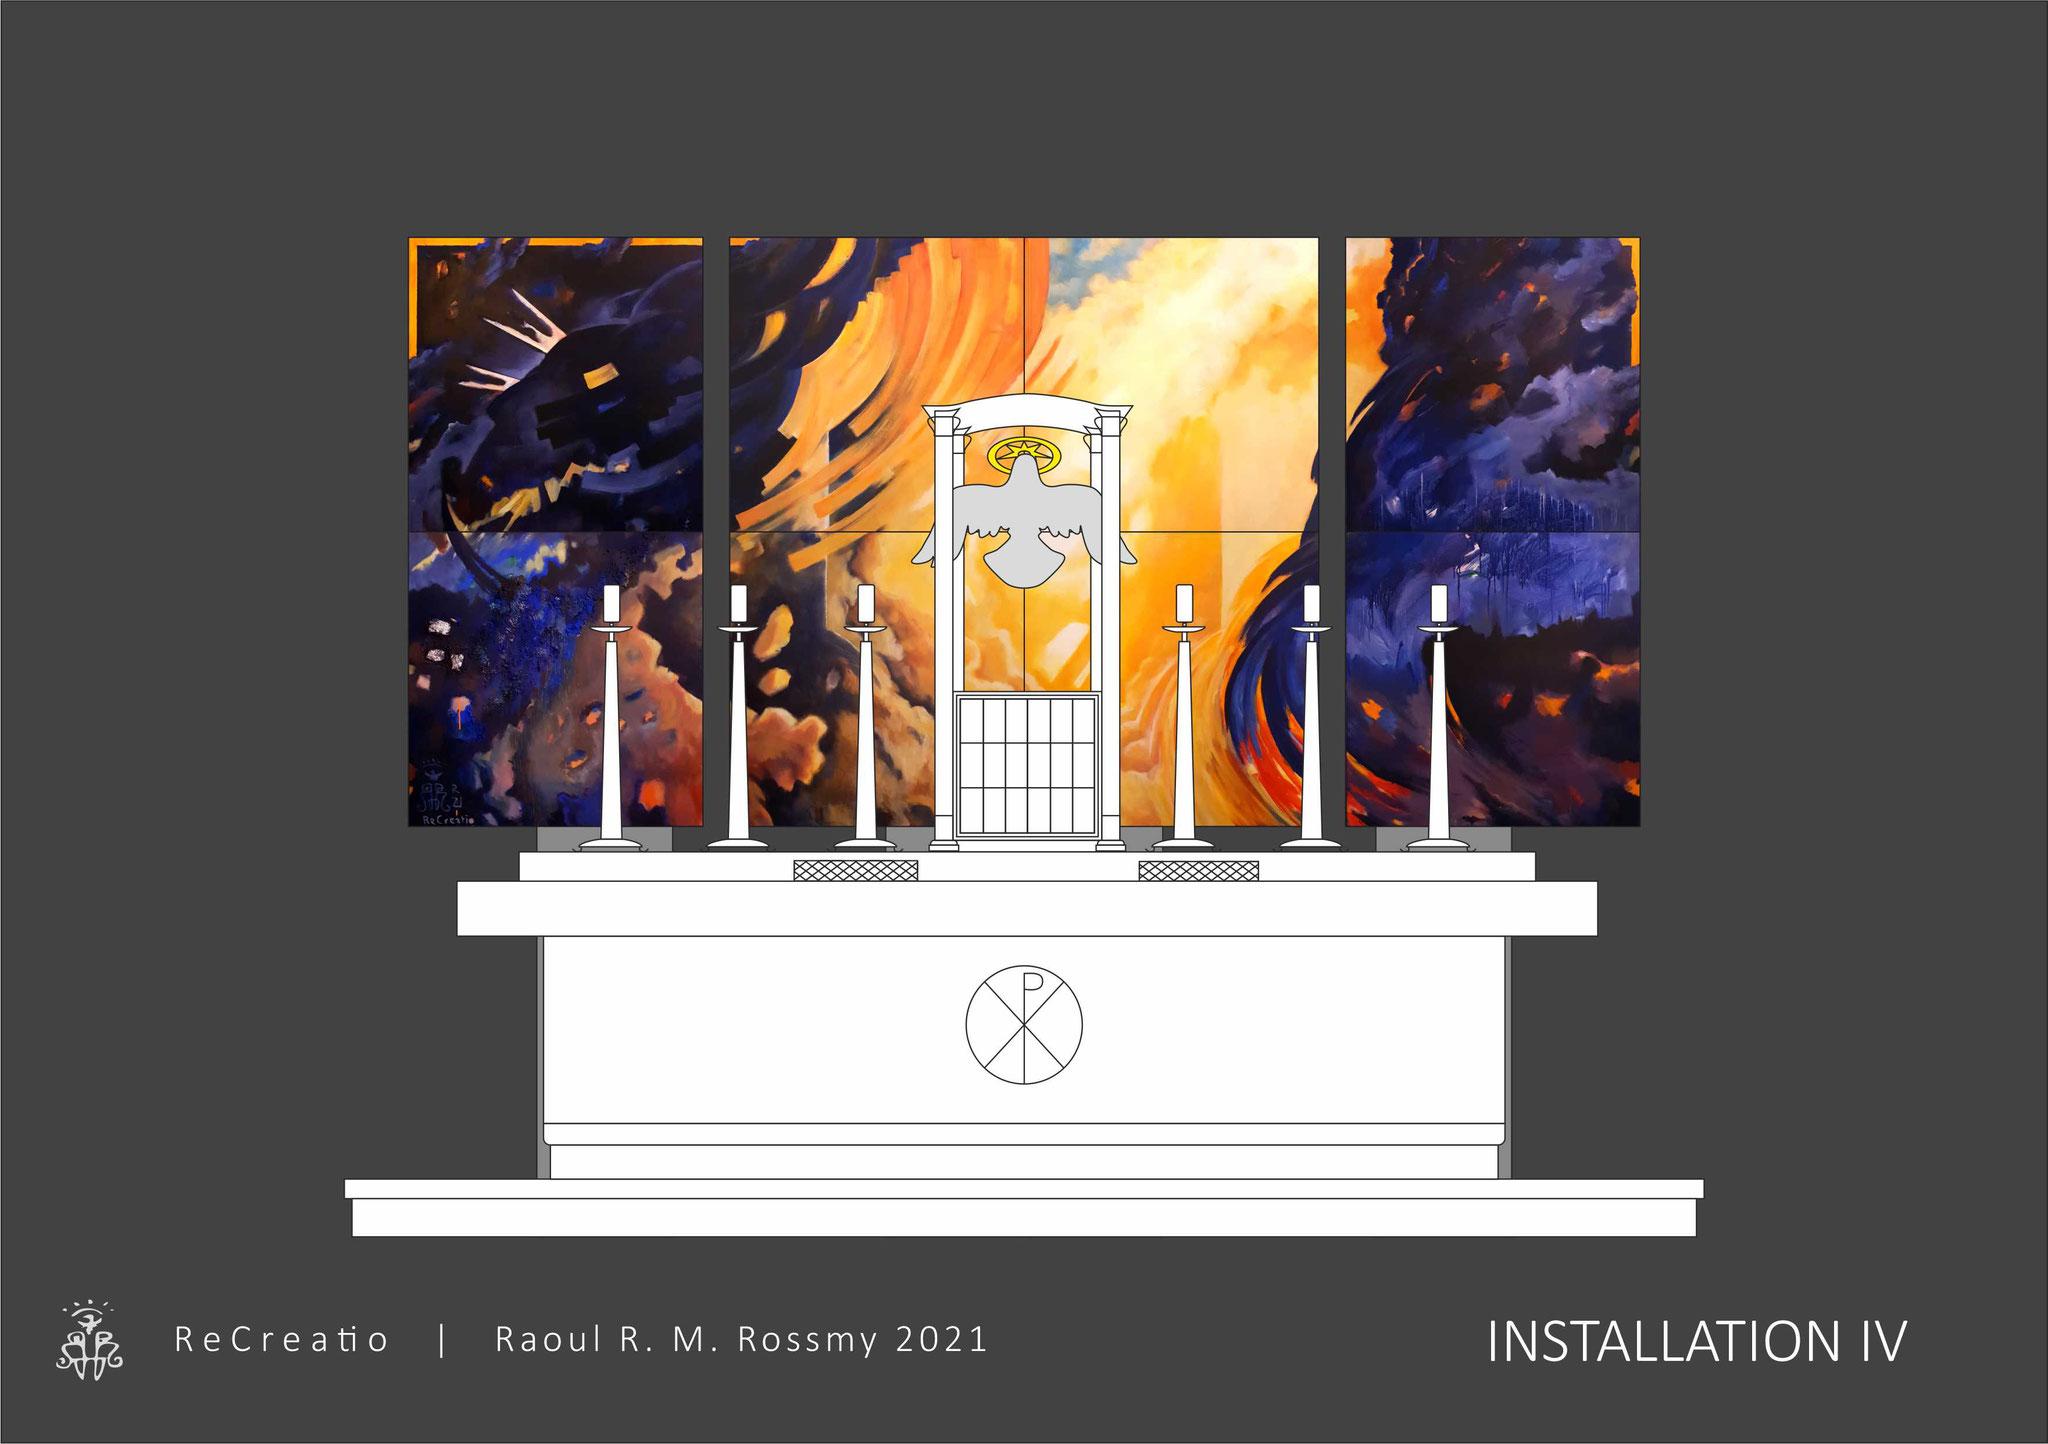 ReCreatio | Raoul R. M. Rossmy 2021 | Installation IV